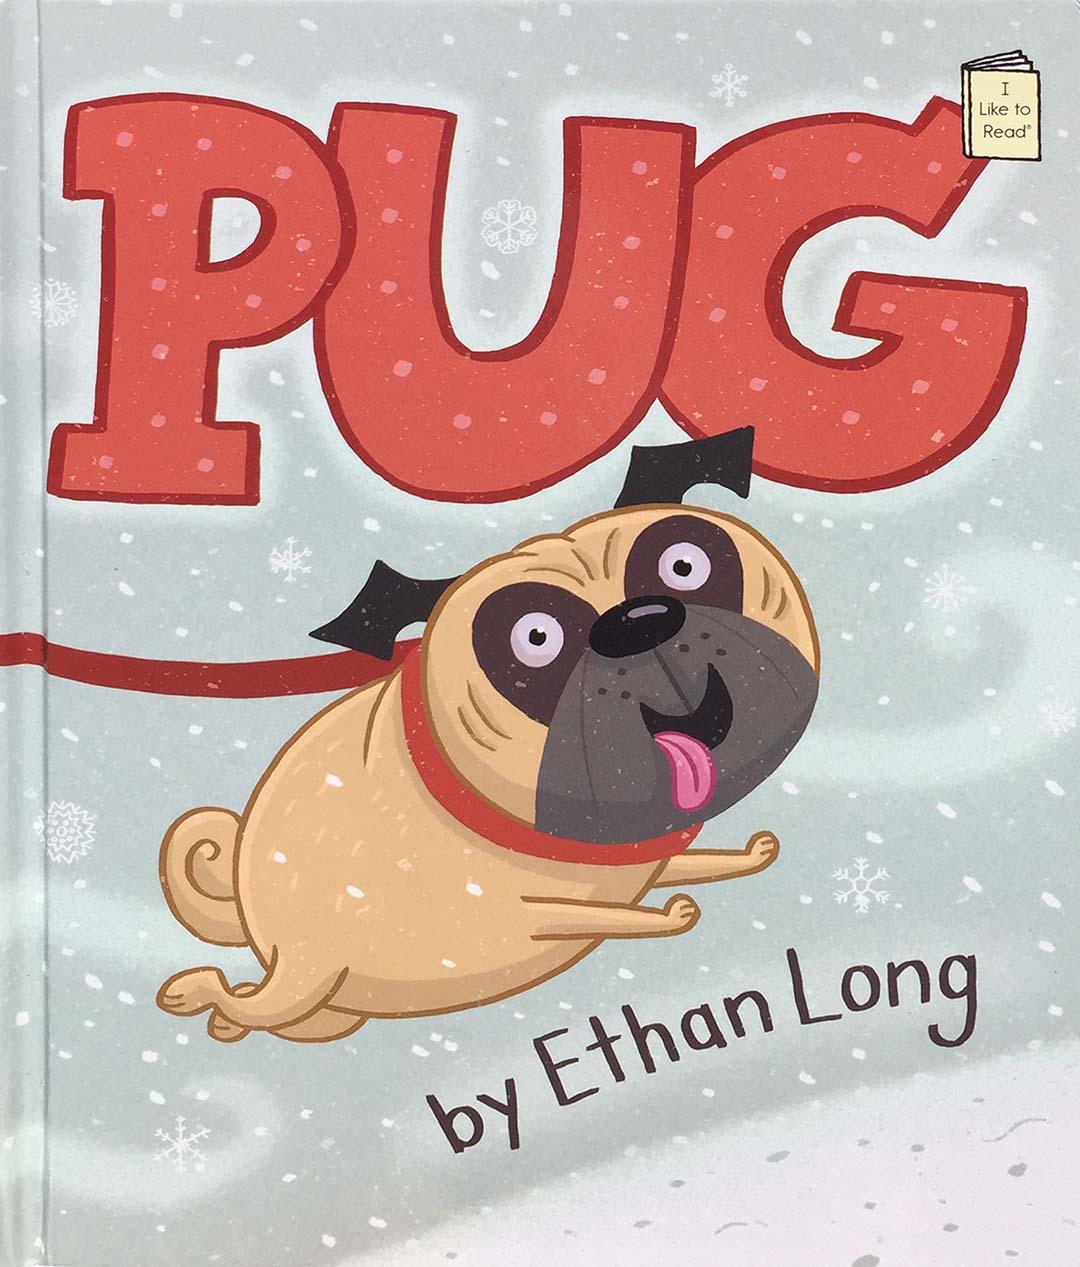 Long, Ethan 2016_07 - PUG - ER - RLM PR .jpg